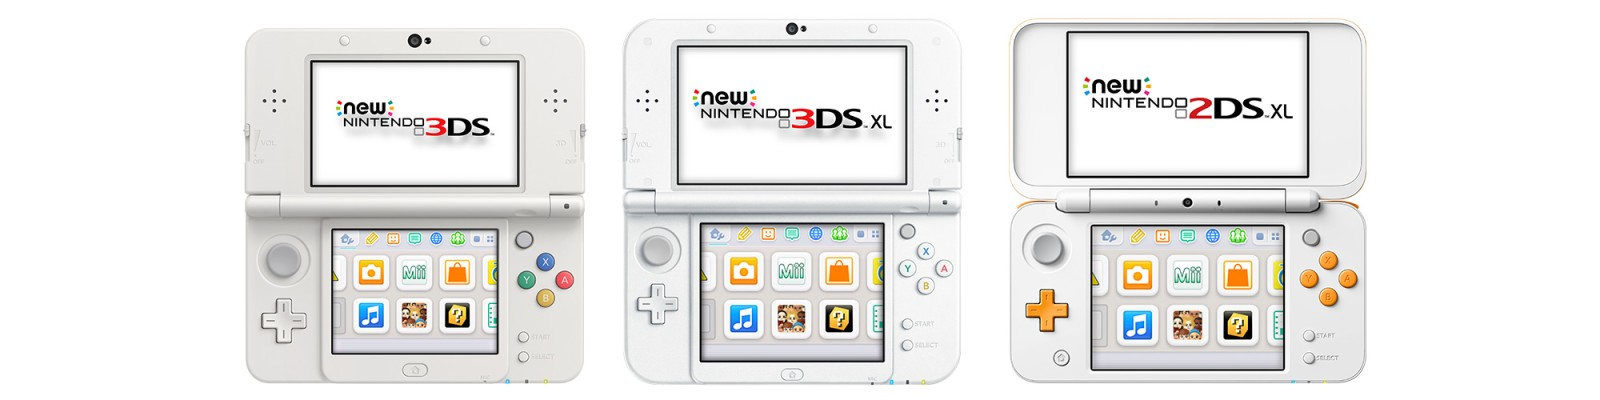 Nintendo 3DS je stále populární Nintendo3DSFamily